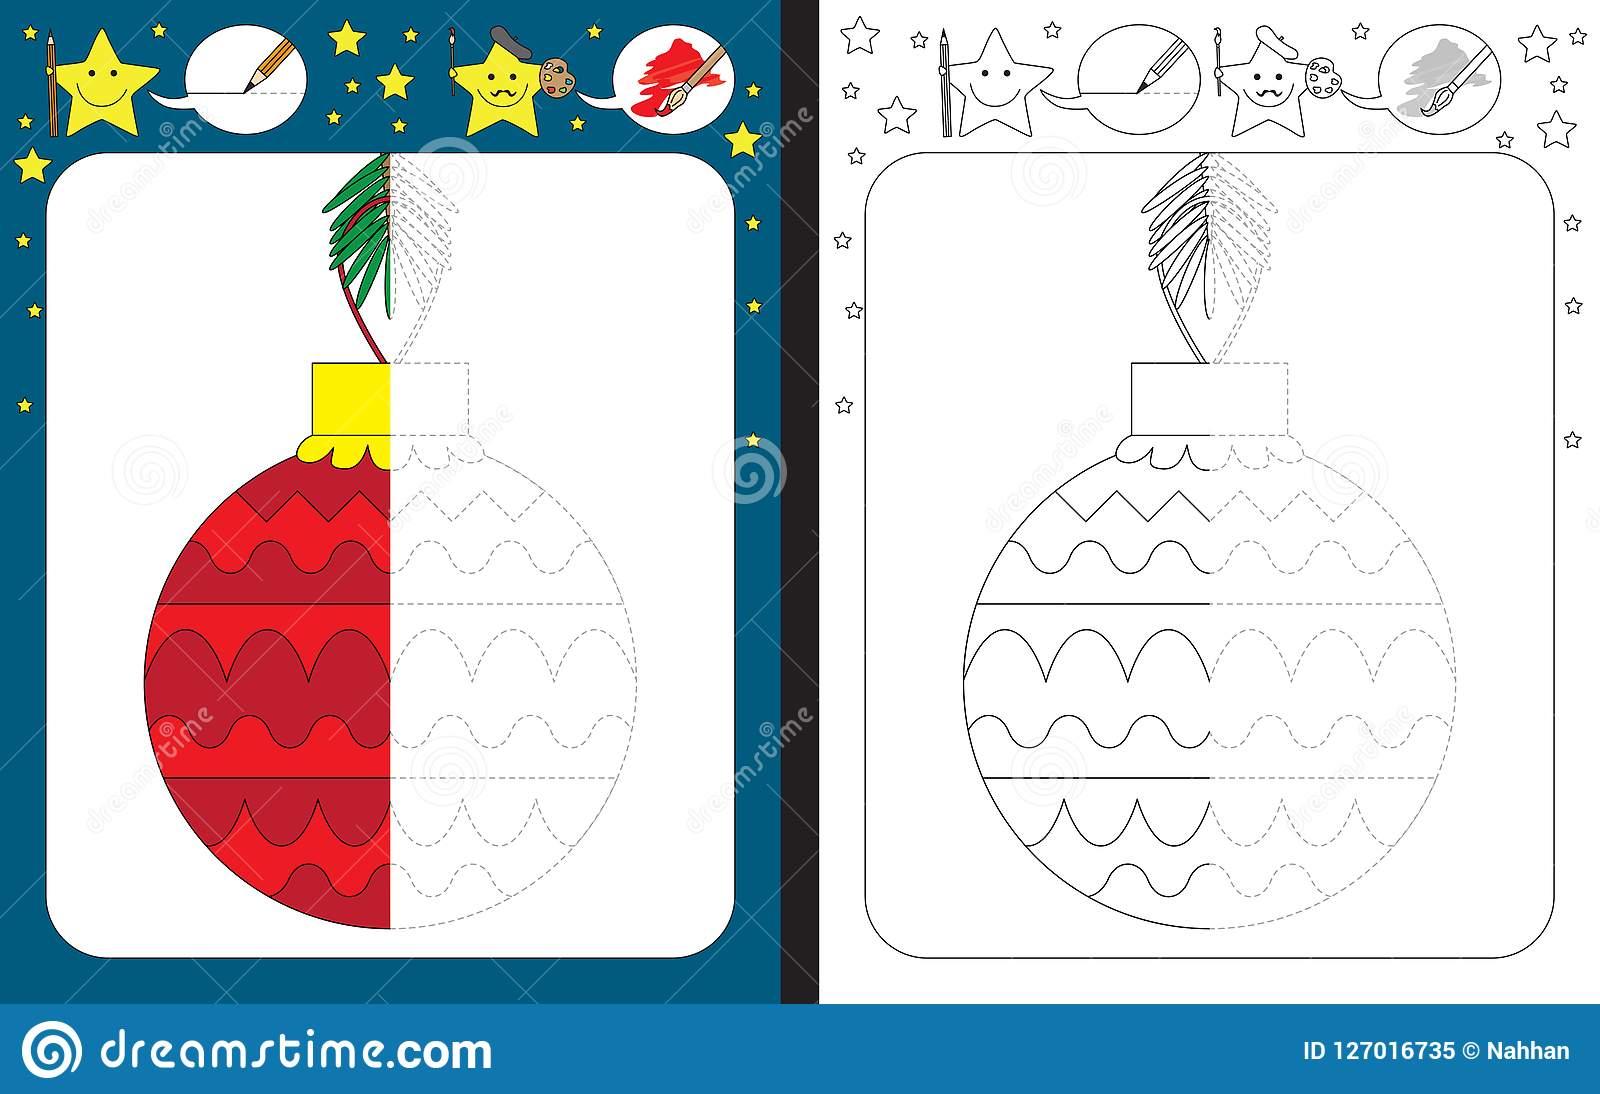 Preschool Worksheet Stock Vector. Illustration Of Line